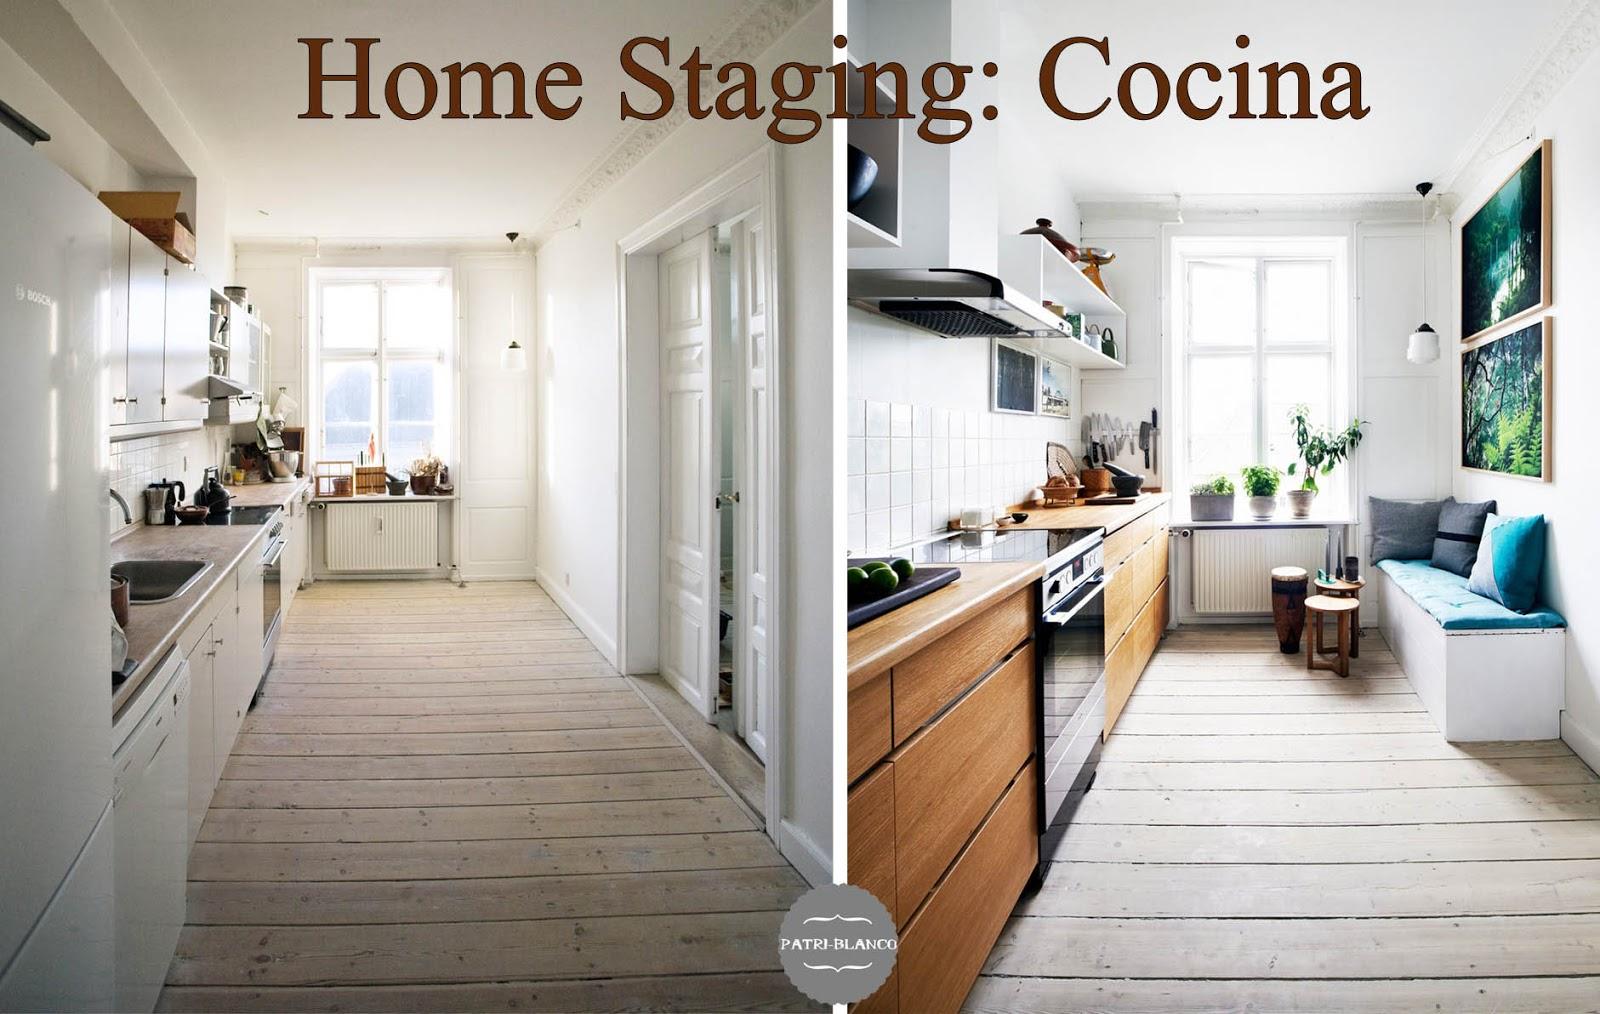 Antes y despu s de una cocina home staging decoraci n for Home staging images